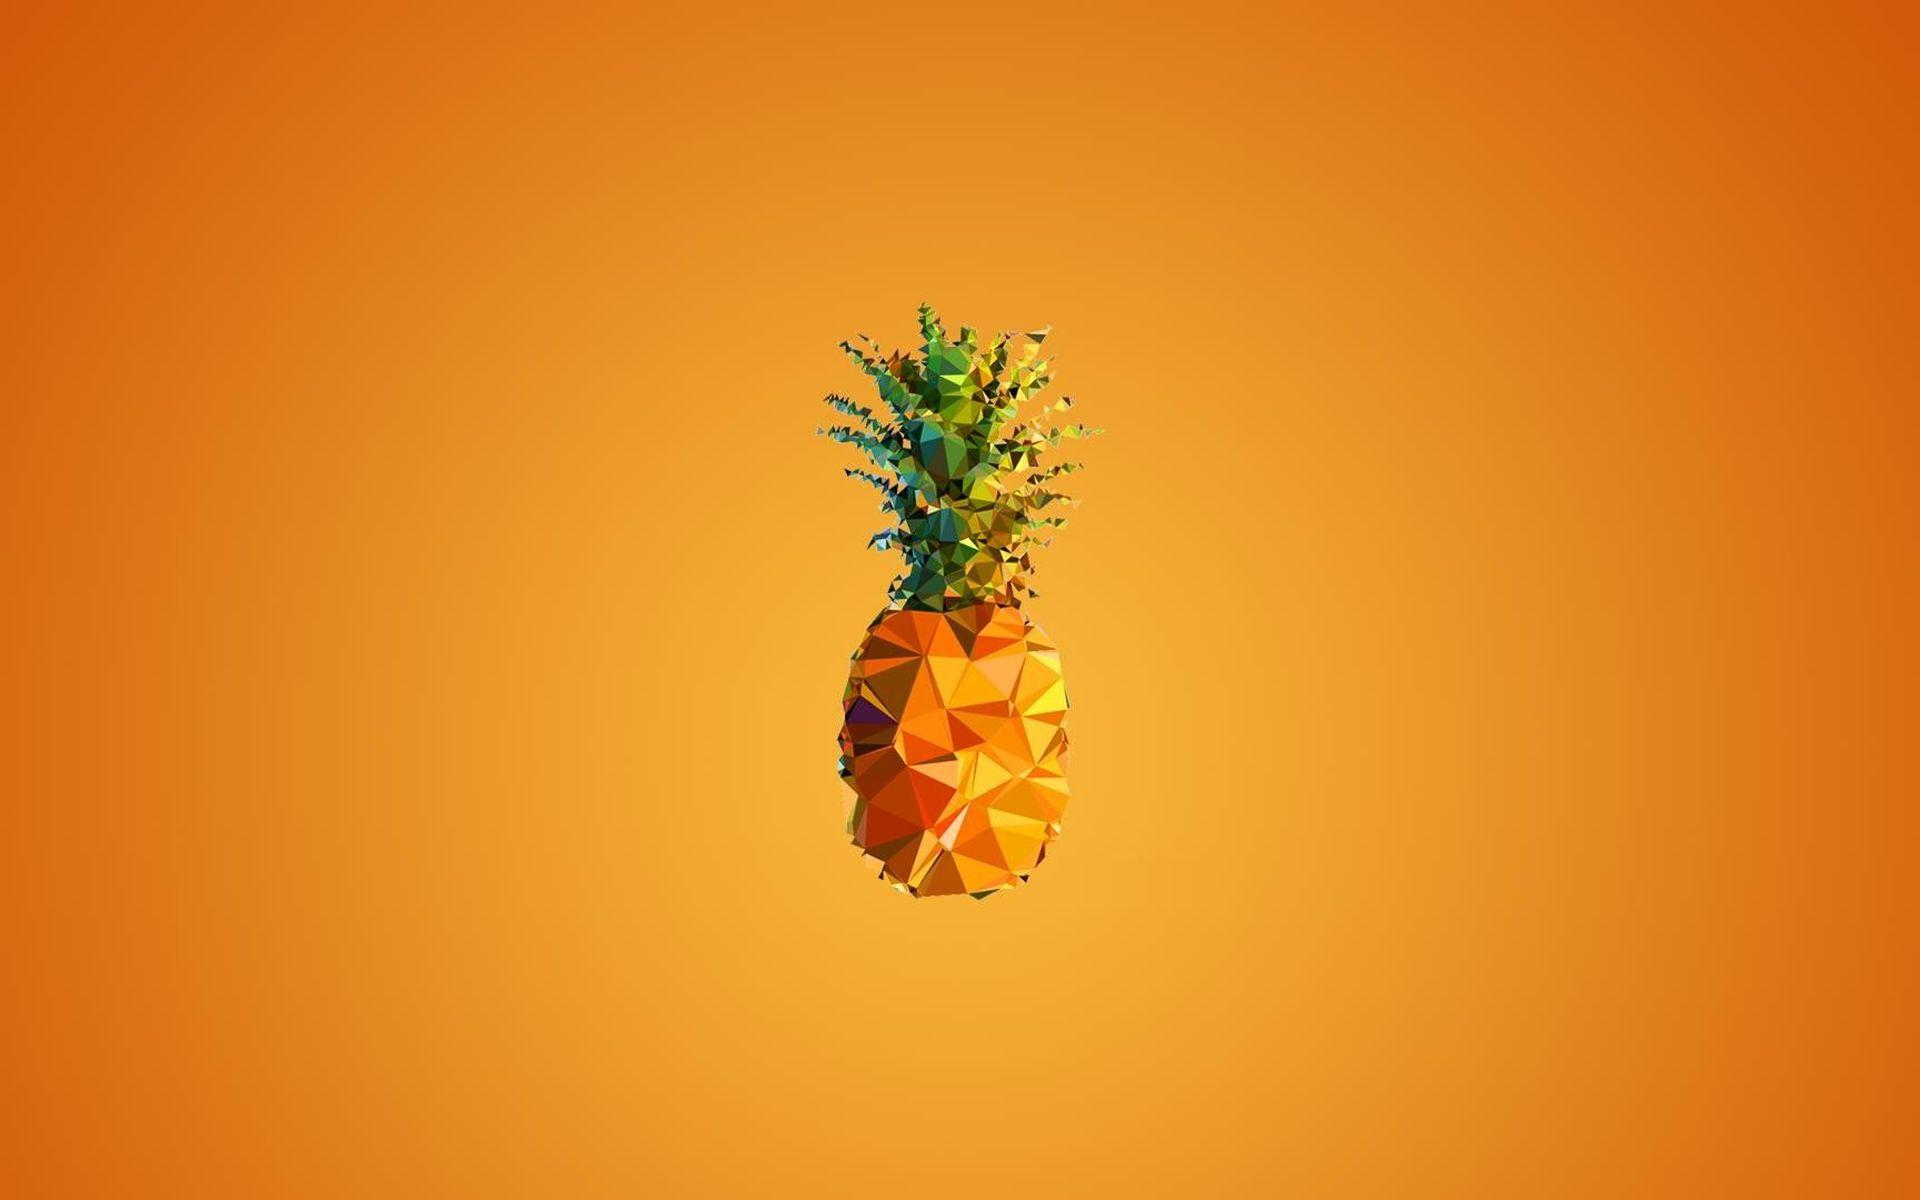 Best Wallpaper Mac Pineapple - 4K-Pineapples-Wallpaper-For-PC  Perfect Image Reference_244960.jpg